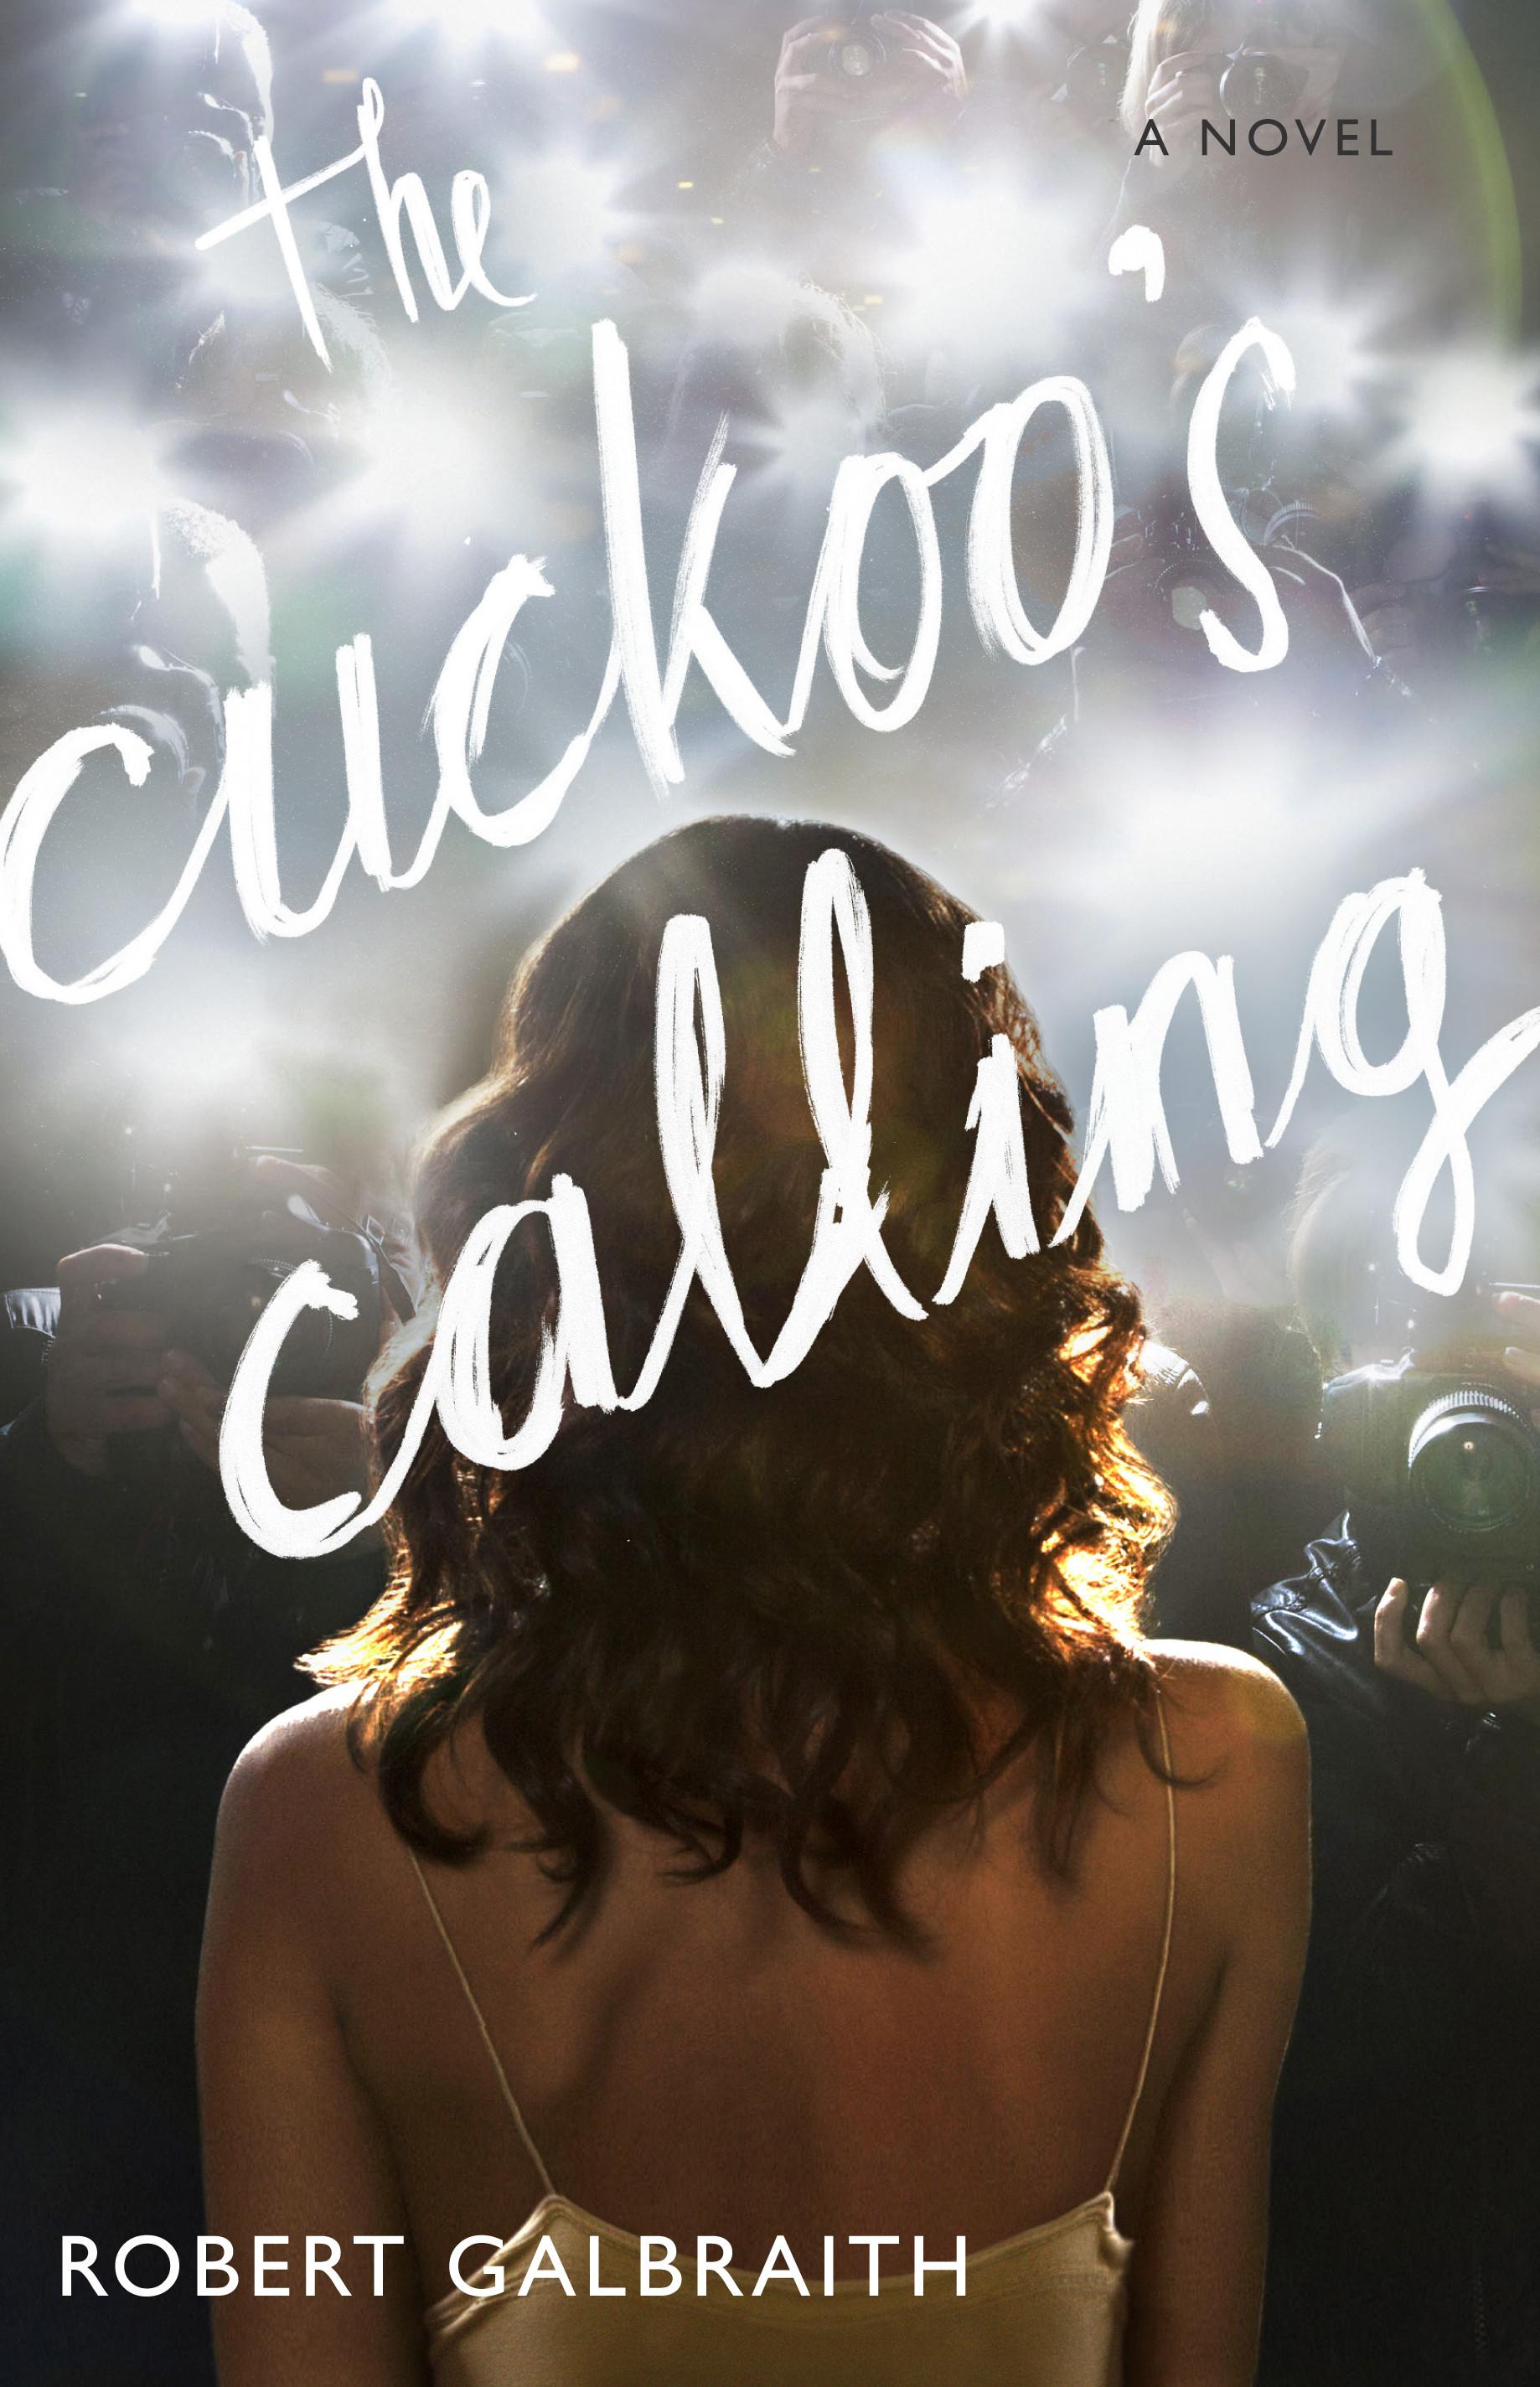 Cover art for Robert Galbraith (aka J K Rowling)'s novel: The Cuckoo's Calling